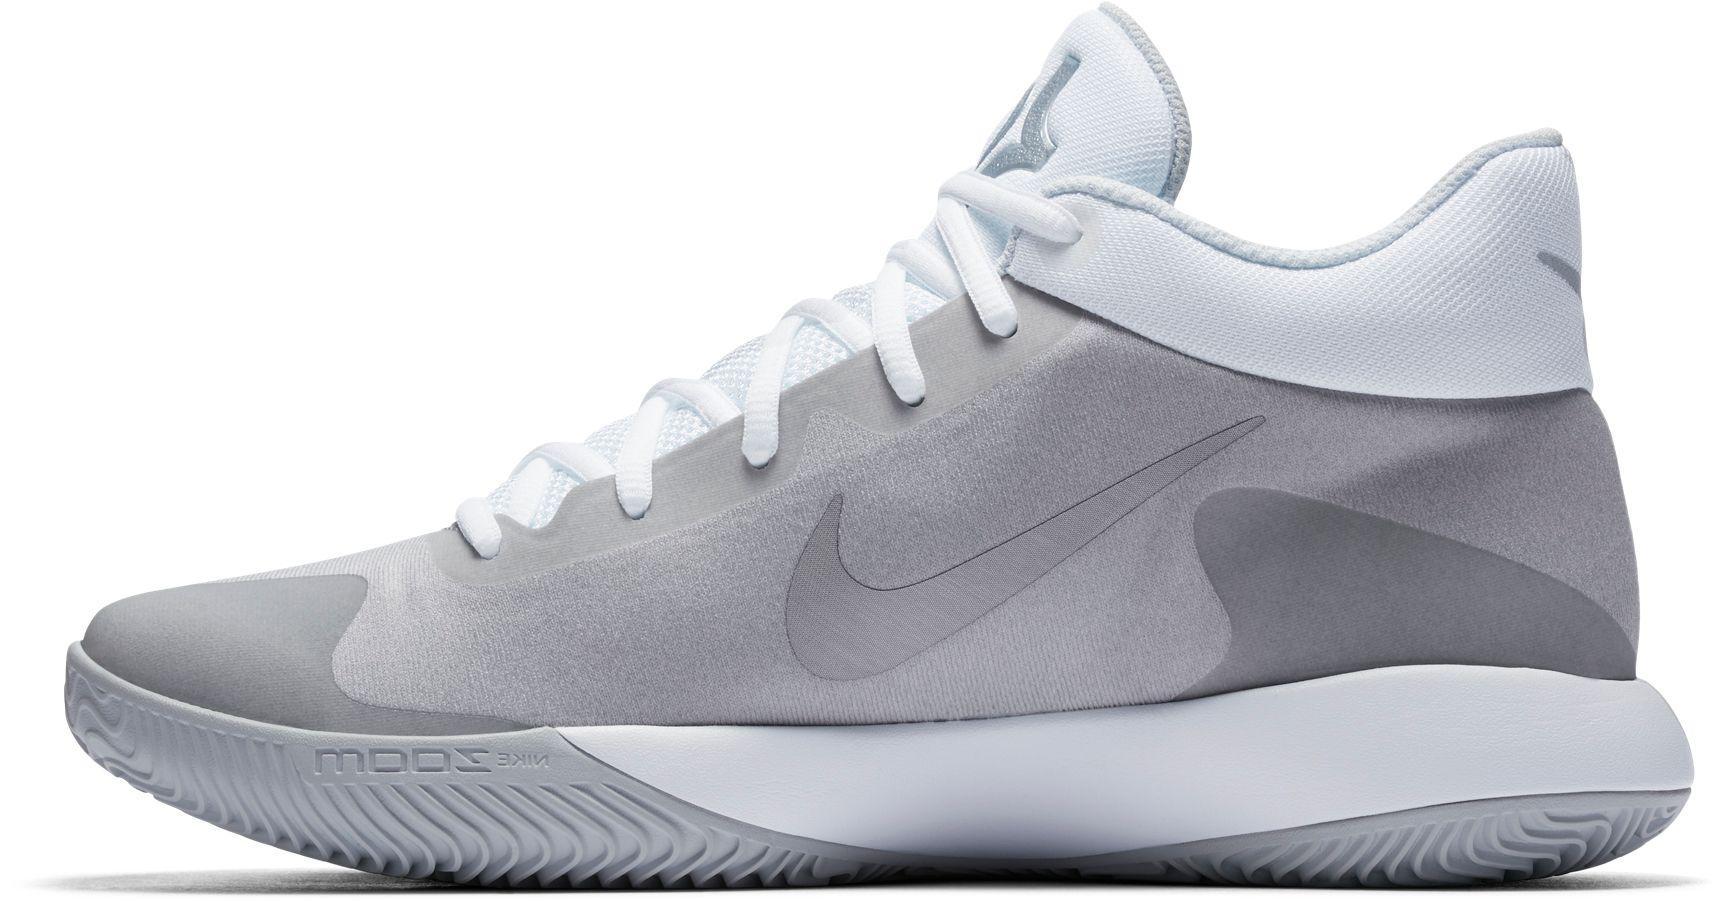 buy online 00aec 4bb8d Nike - Gray Kd Trey 5 V Basketball Shoes for Men - Lyst